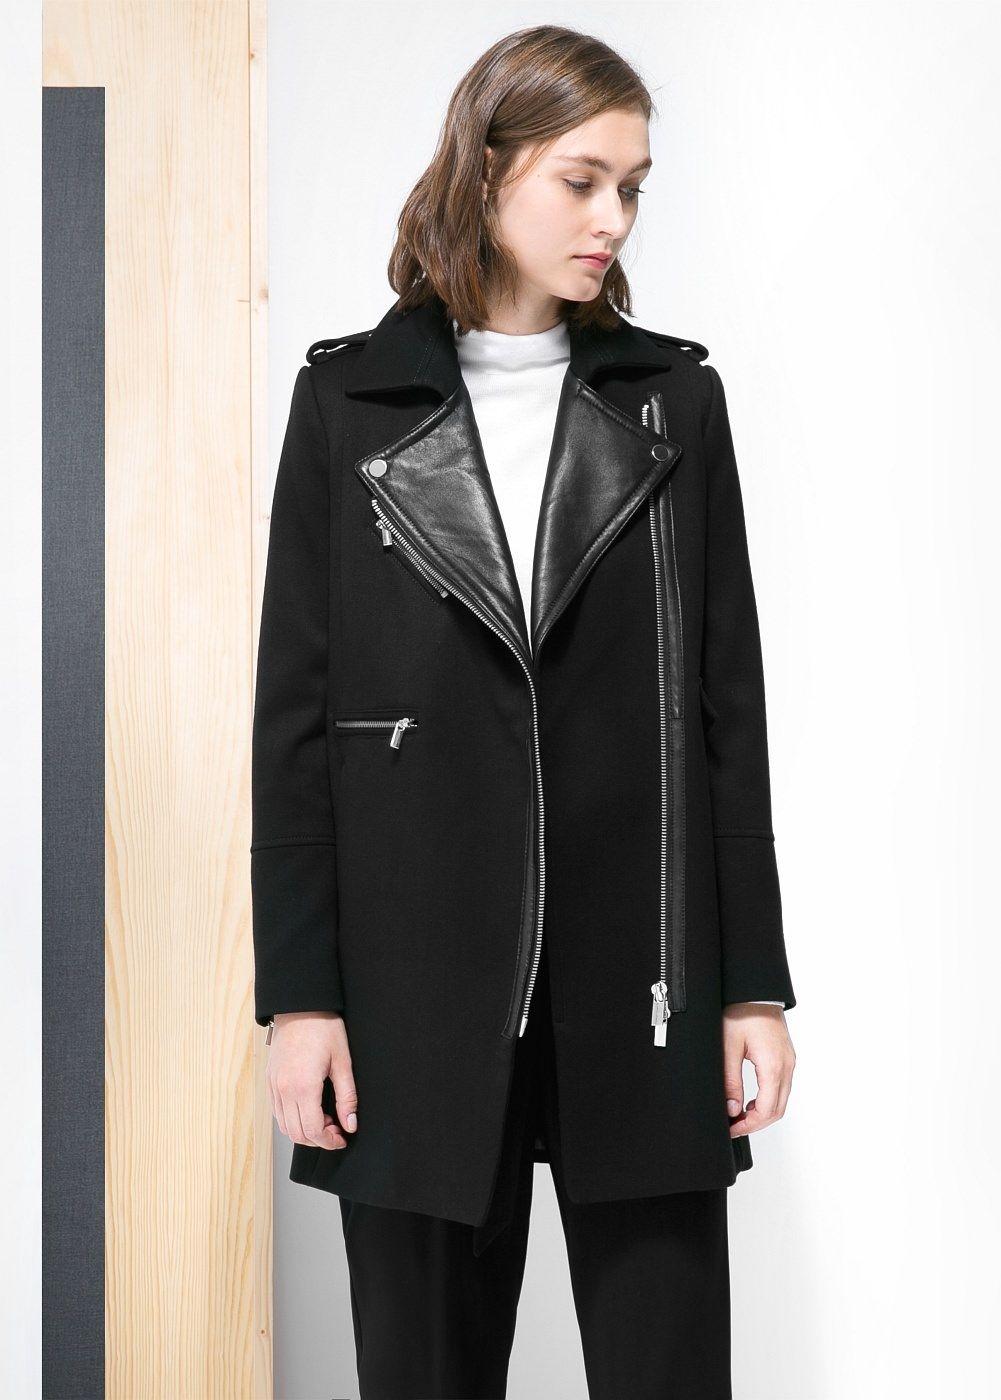 Manteau biker femme minimaliste